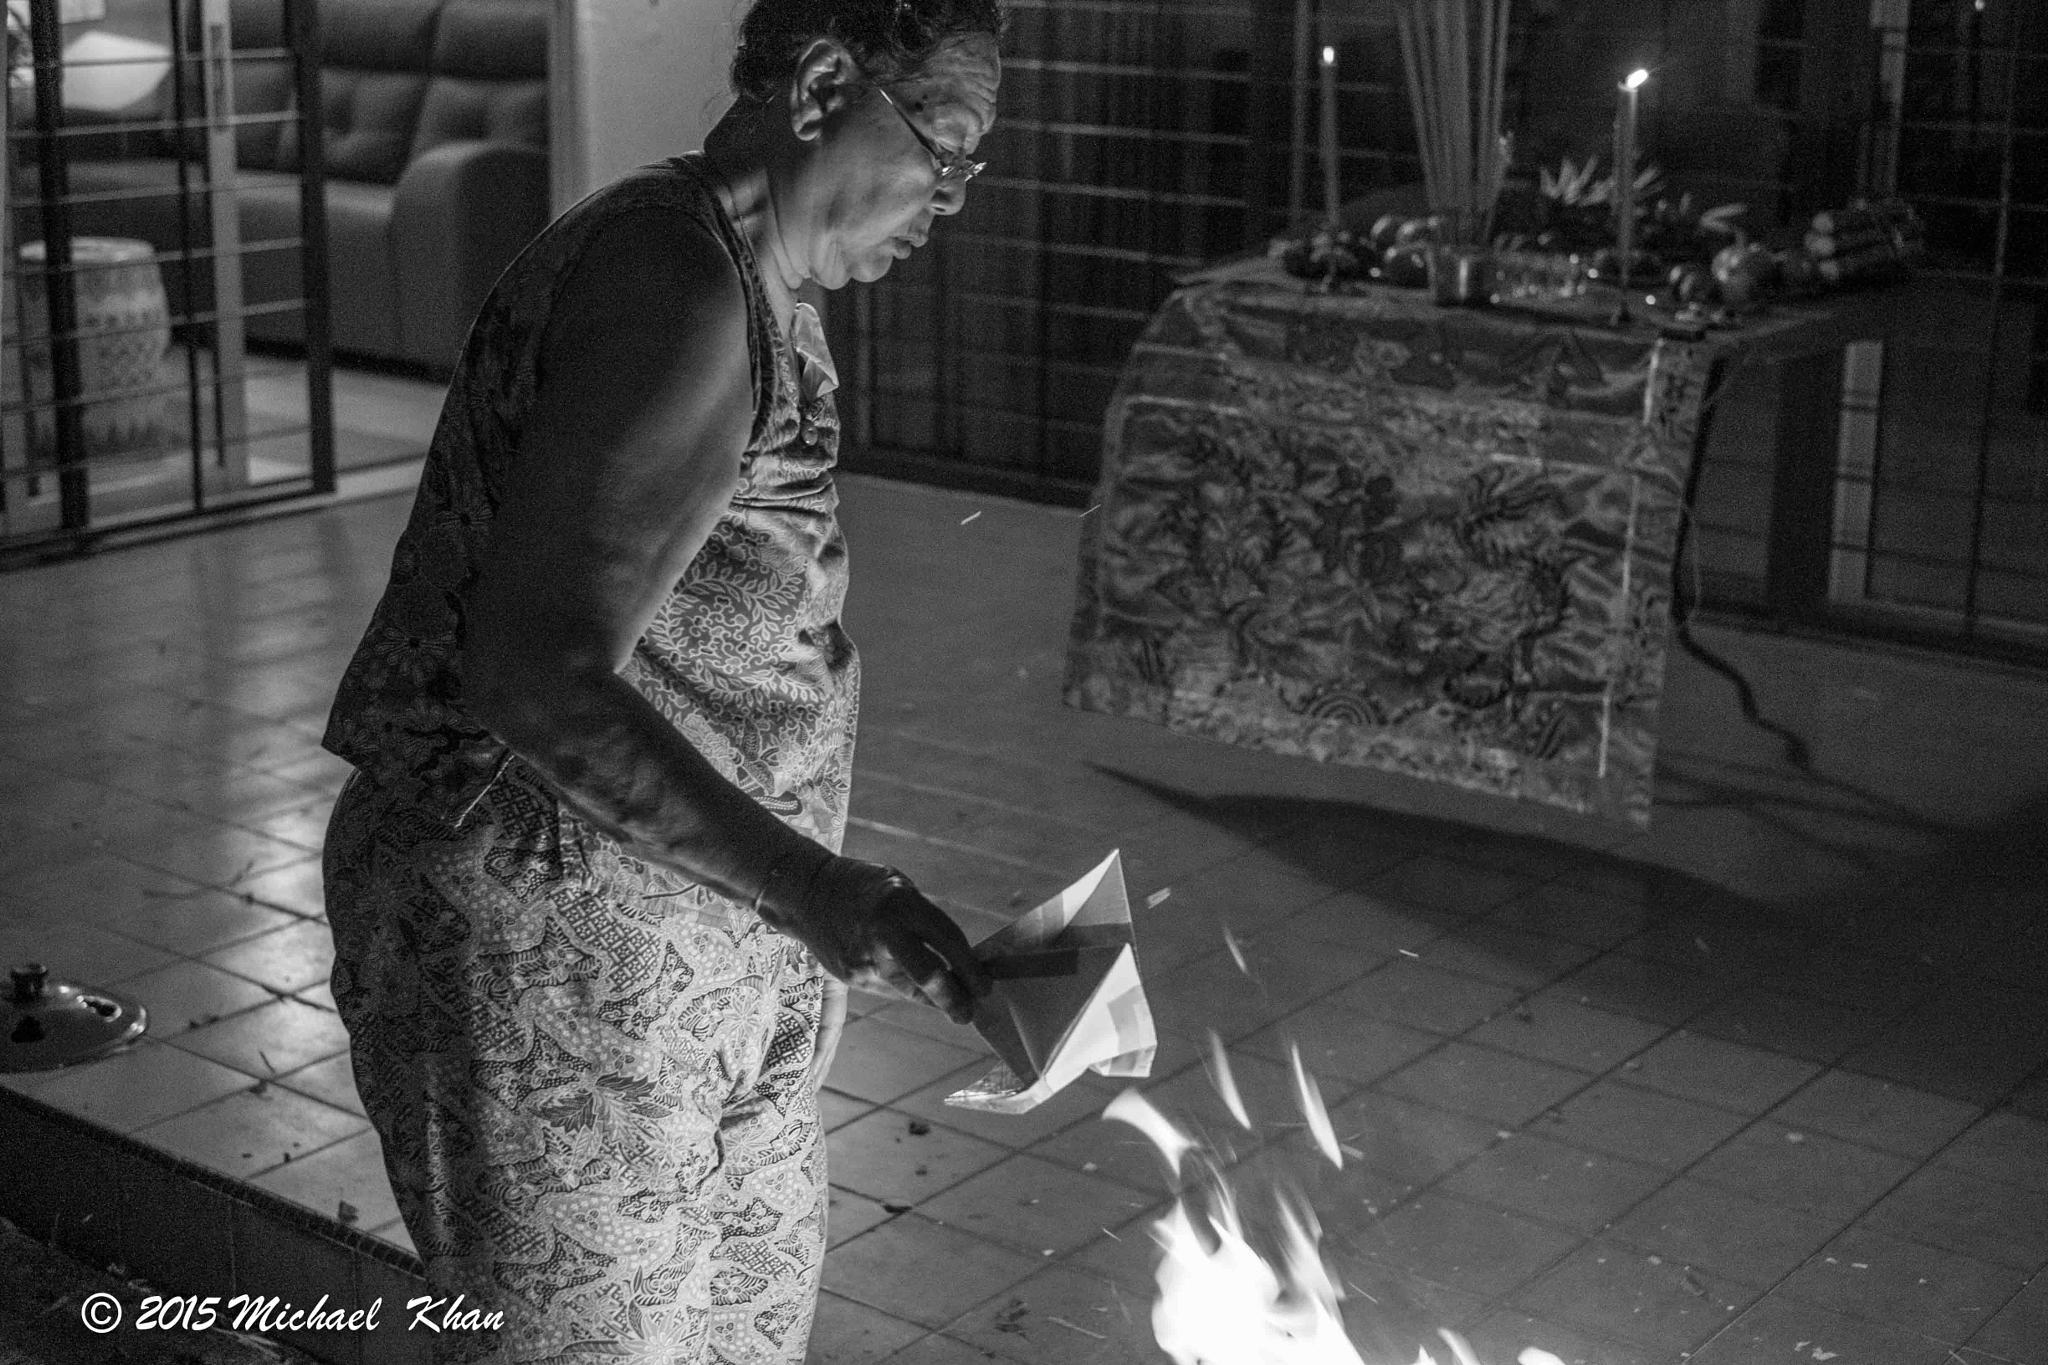 ghost festival by Michael Khan